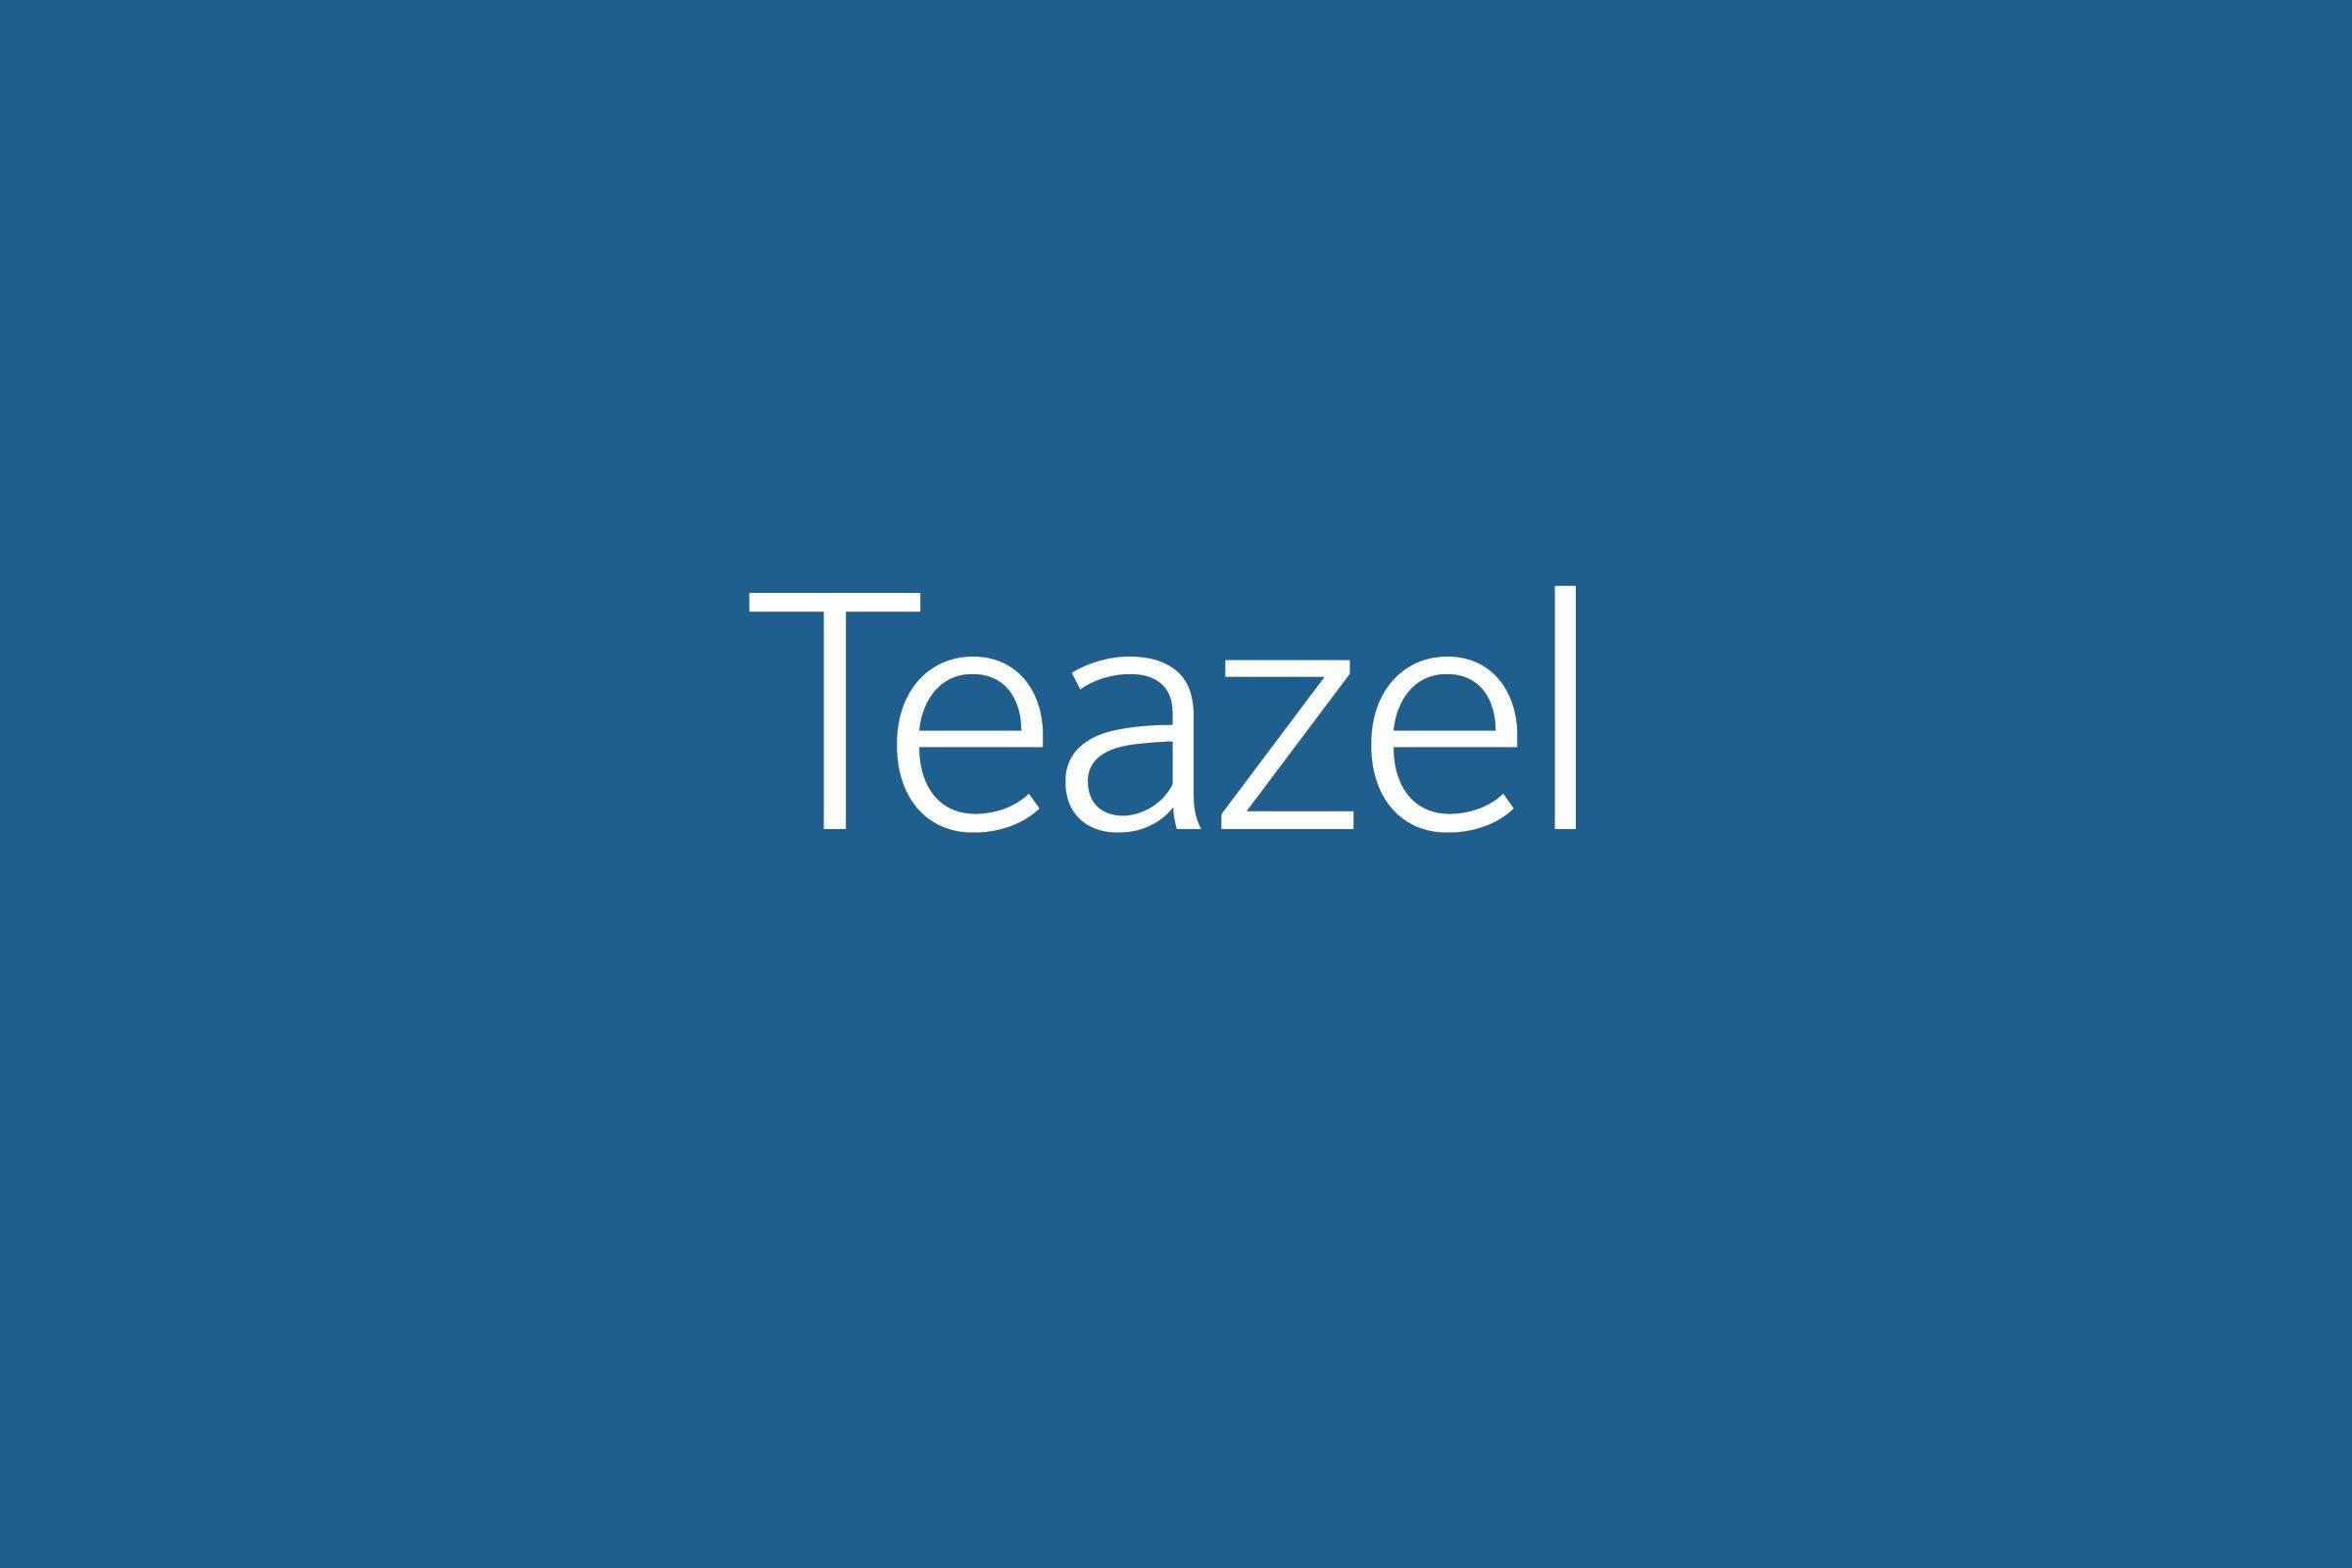 teazel funny word Funny words